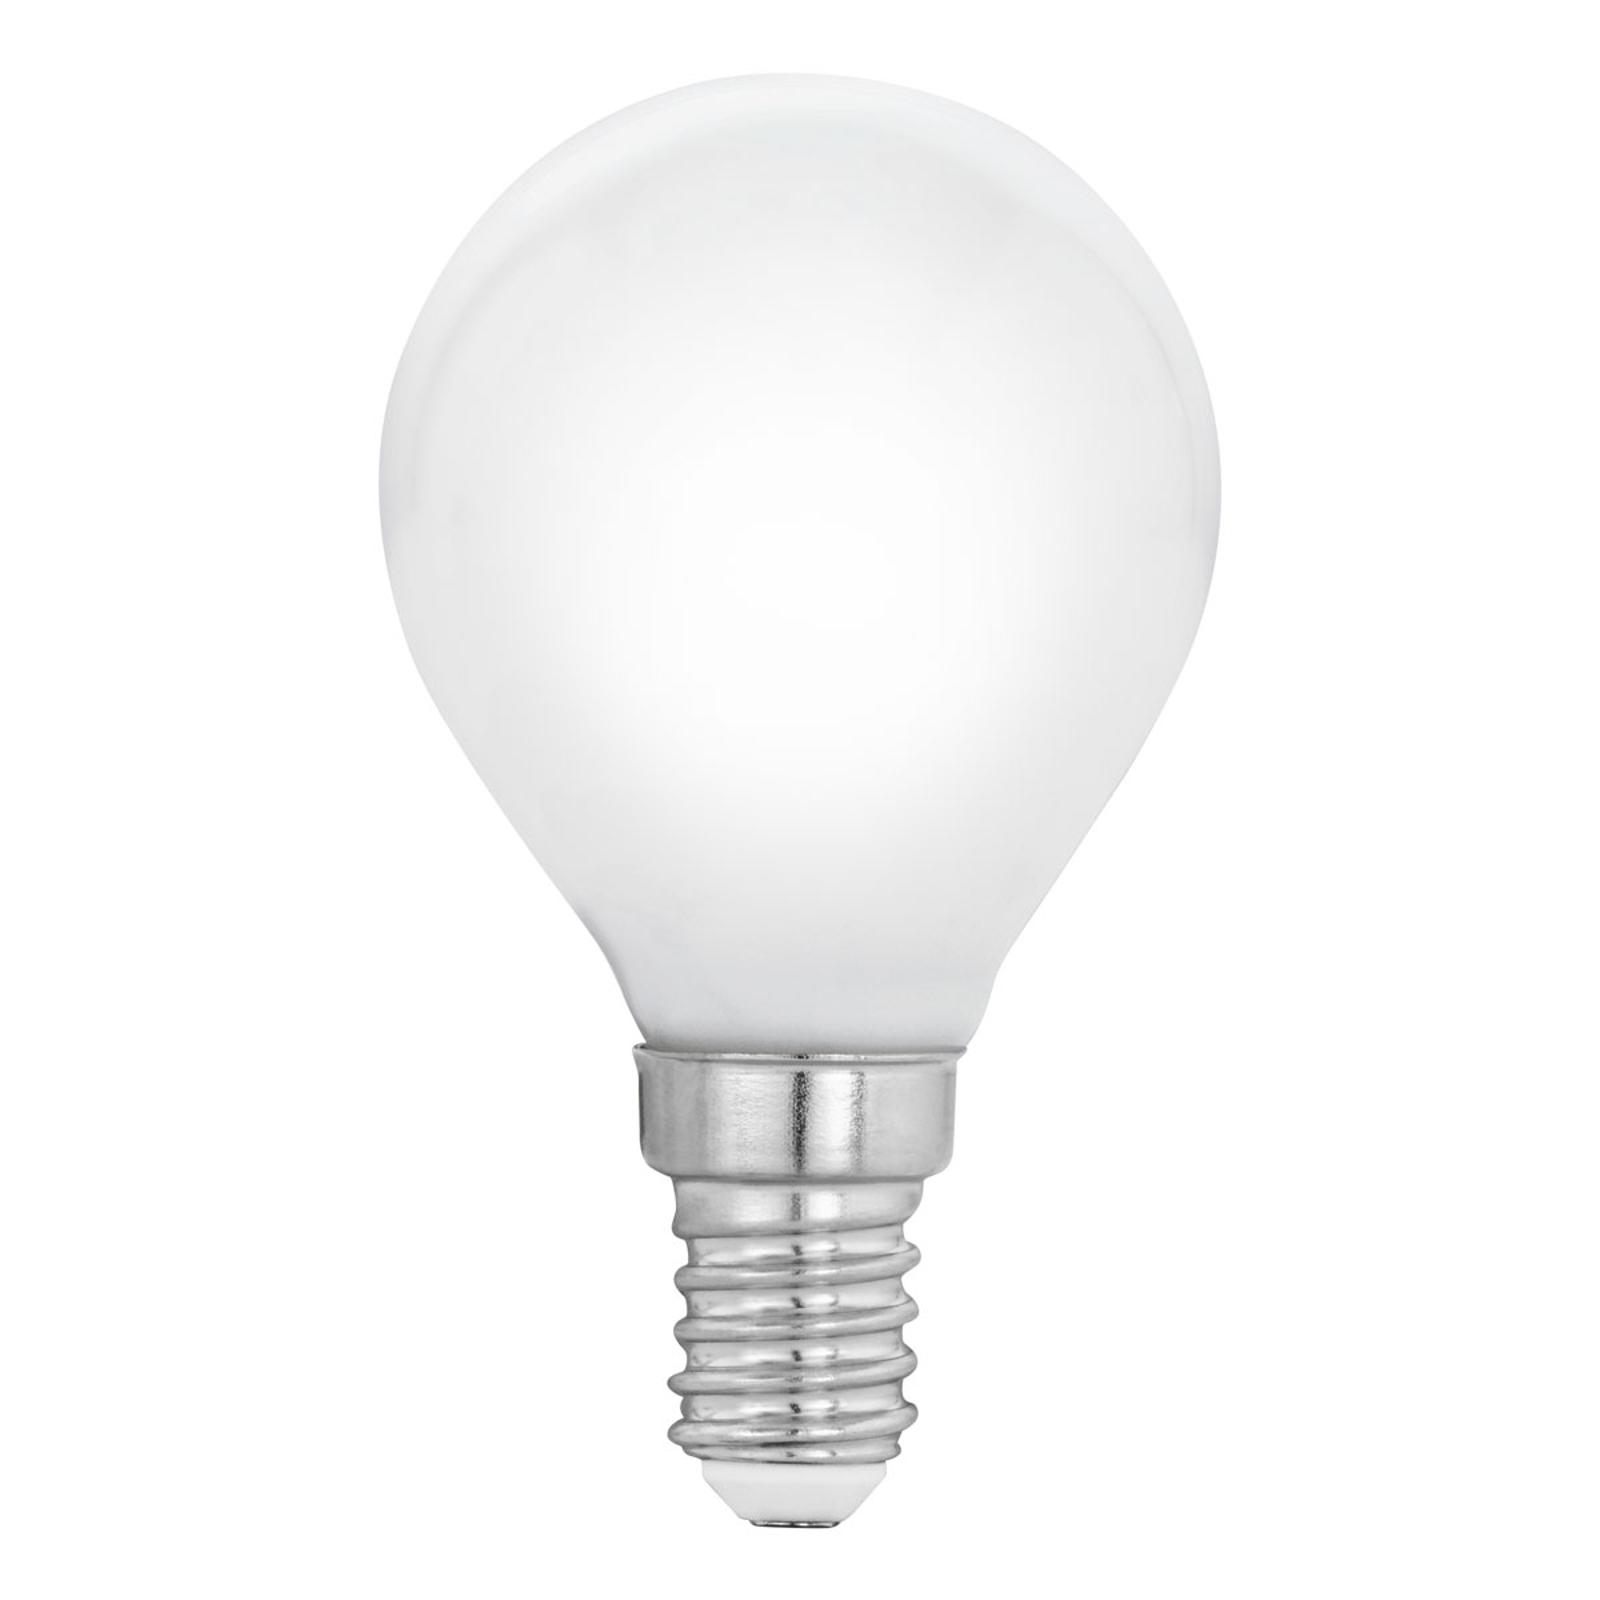 iDual E14 LED lampa 2 set med fjärrkontroll | Lamp24.se